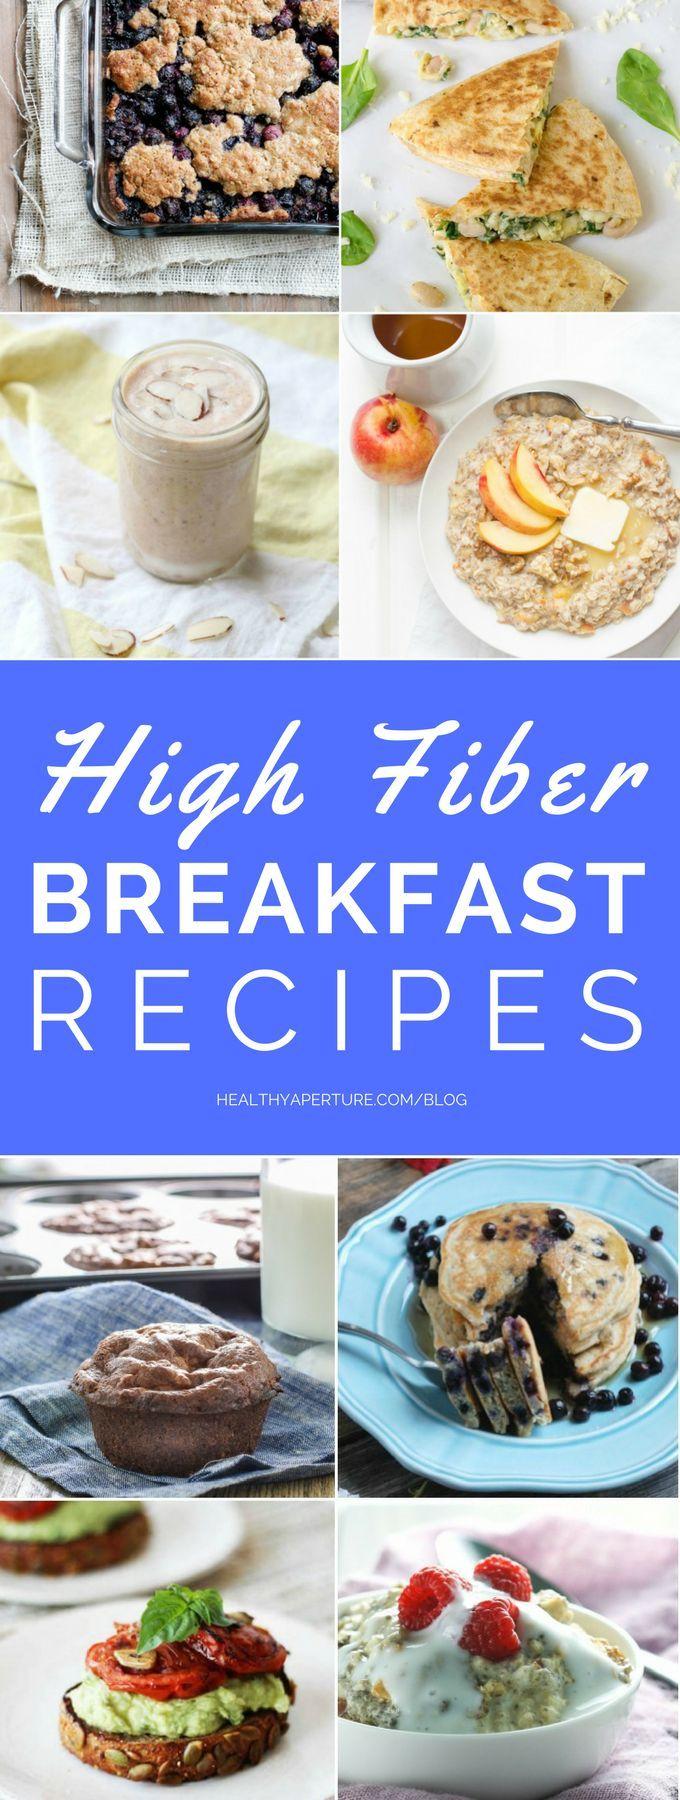 Breakfast Food That Is High In Fiber